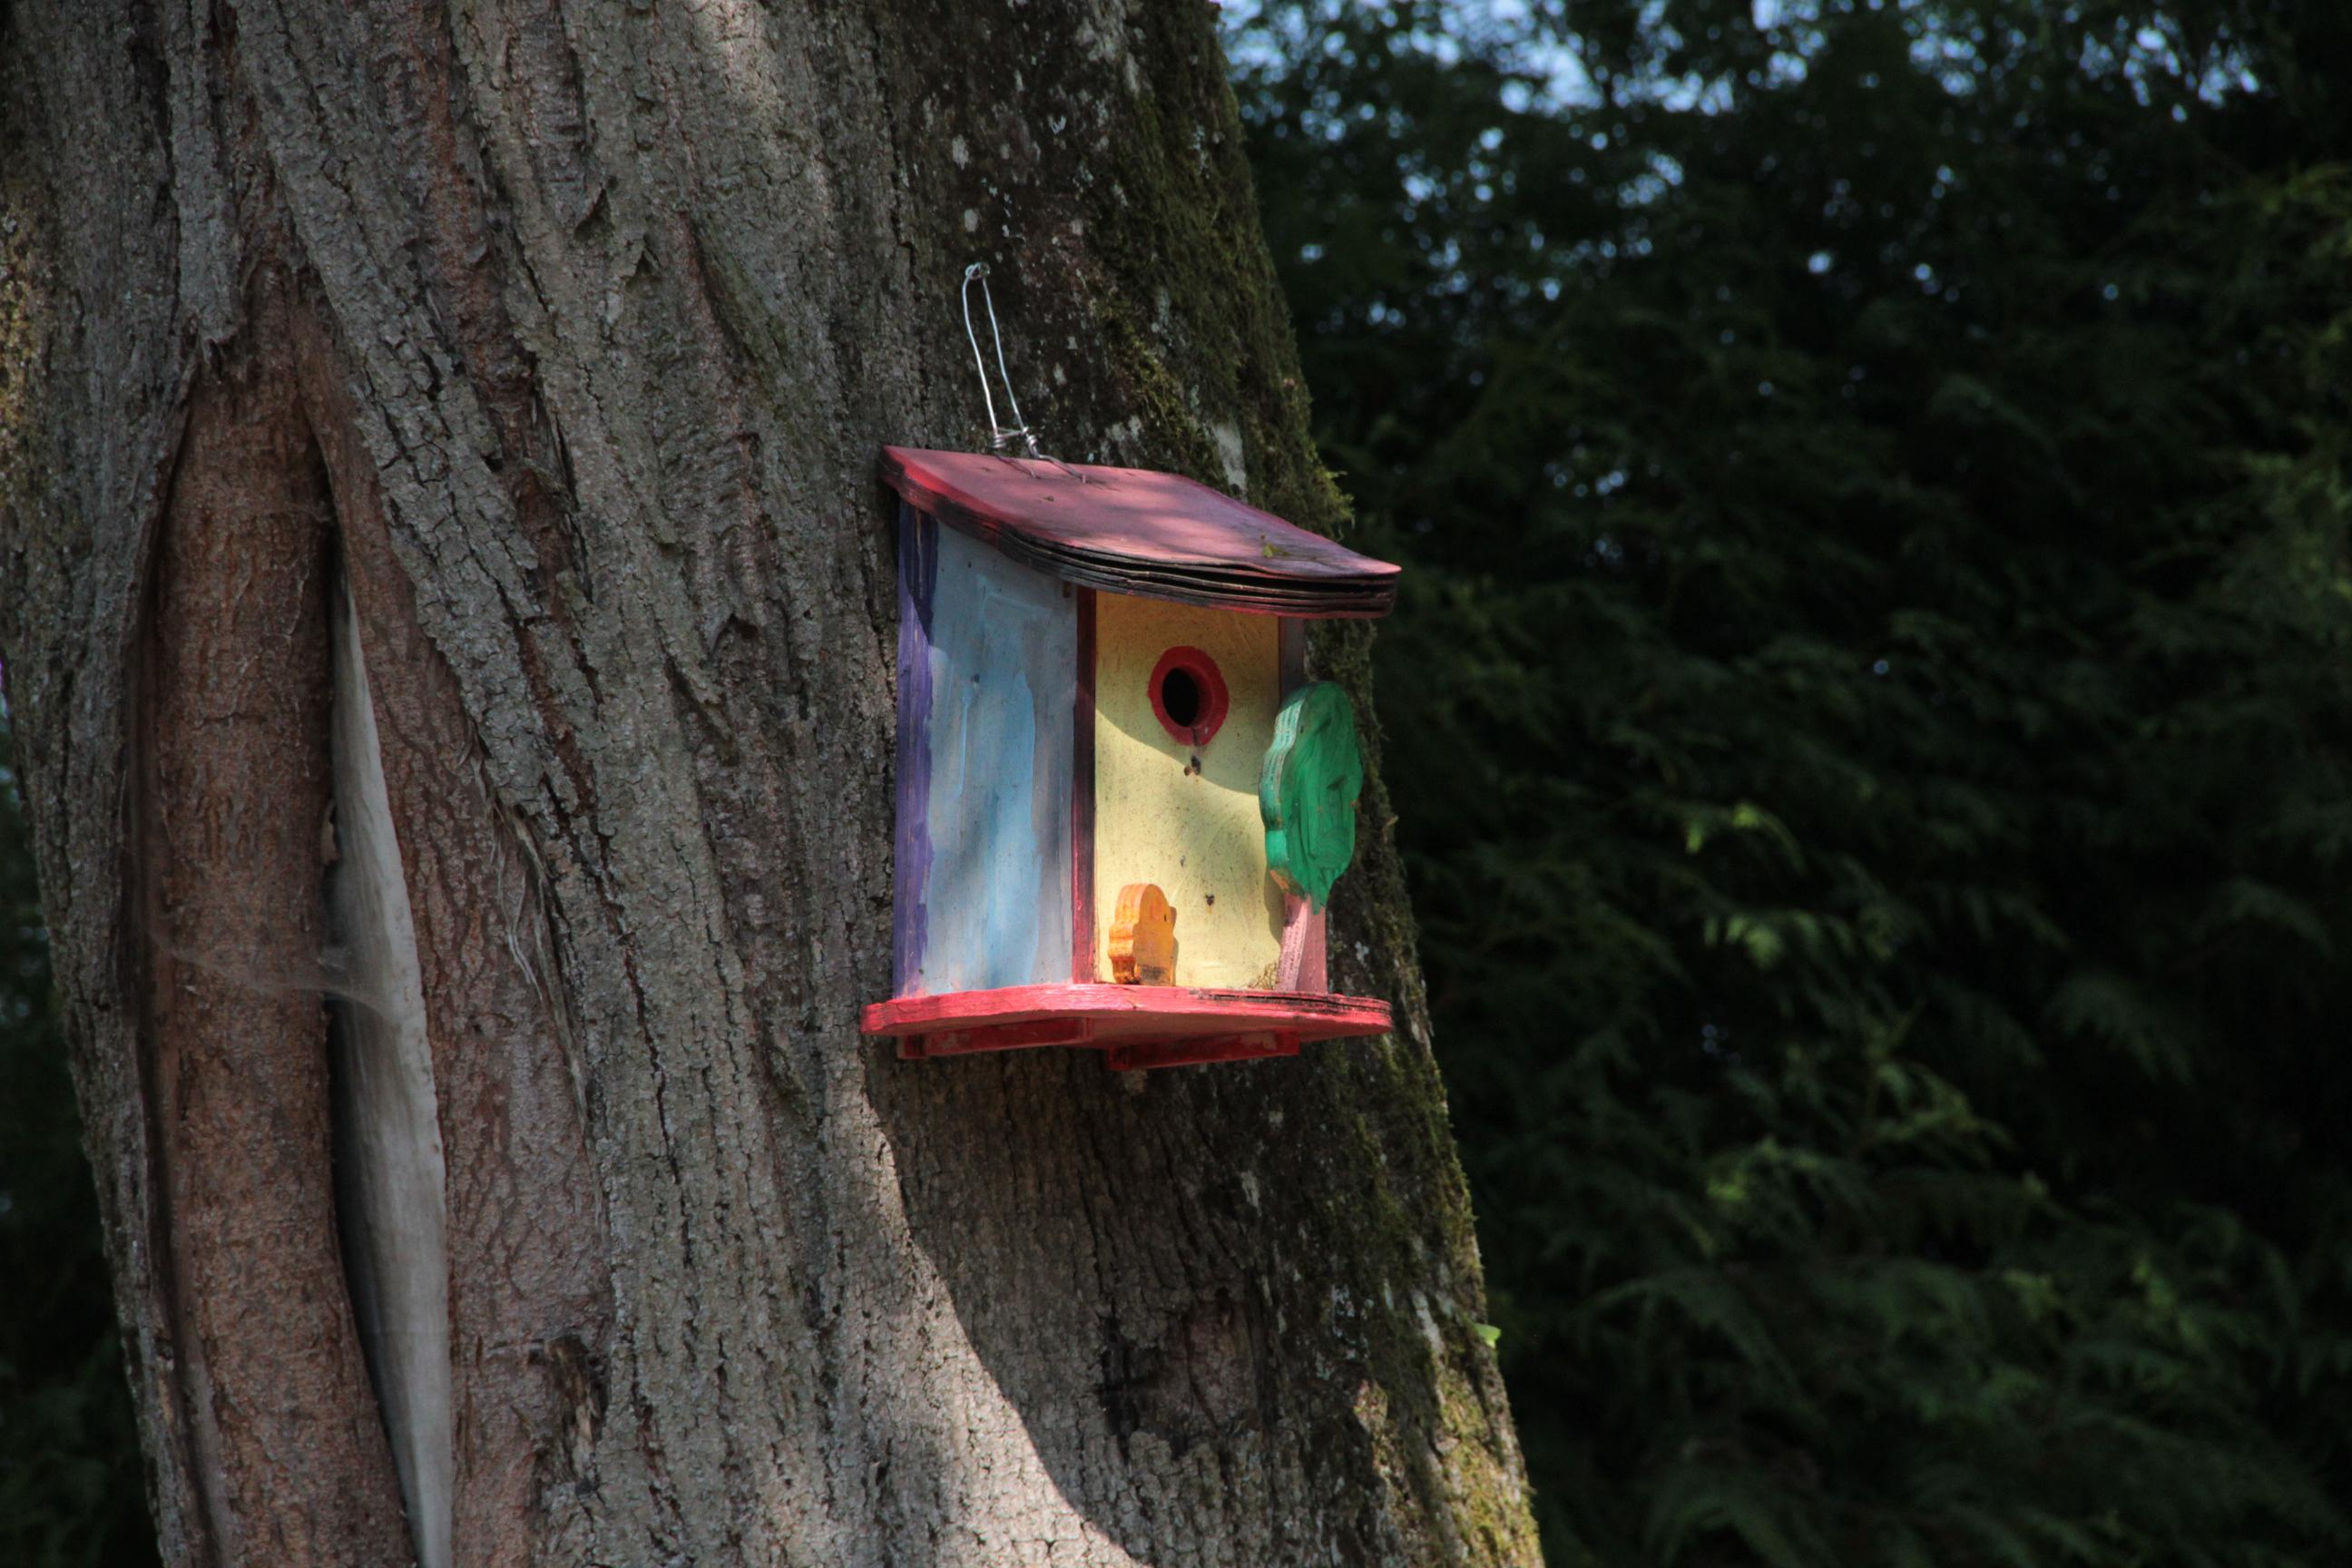 vogelhaus2